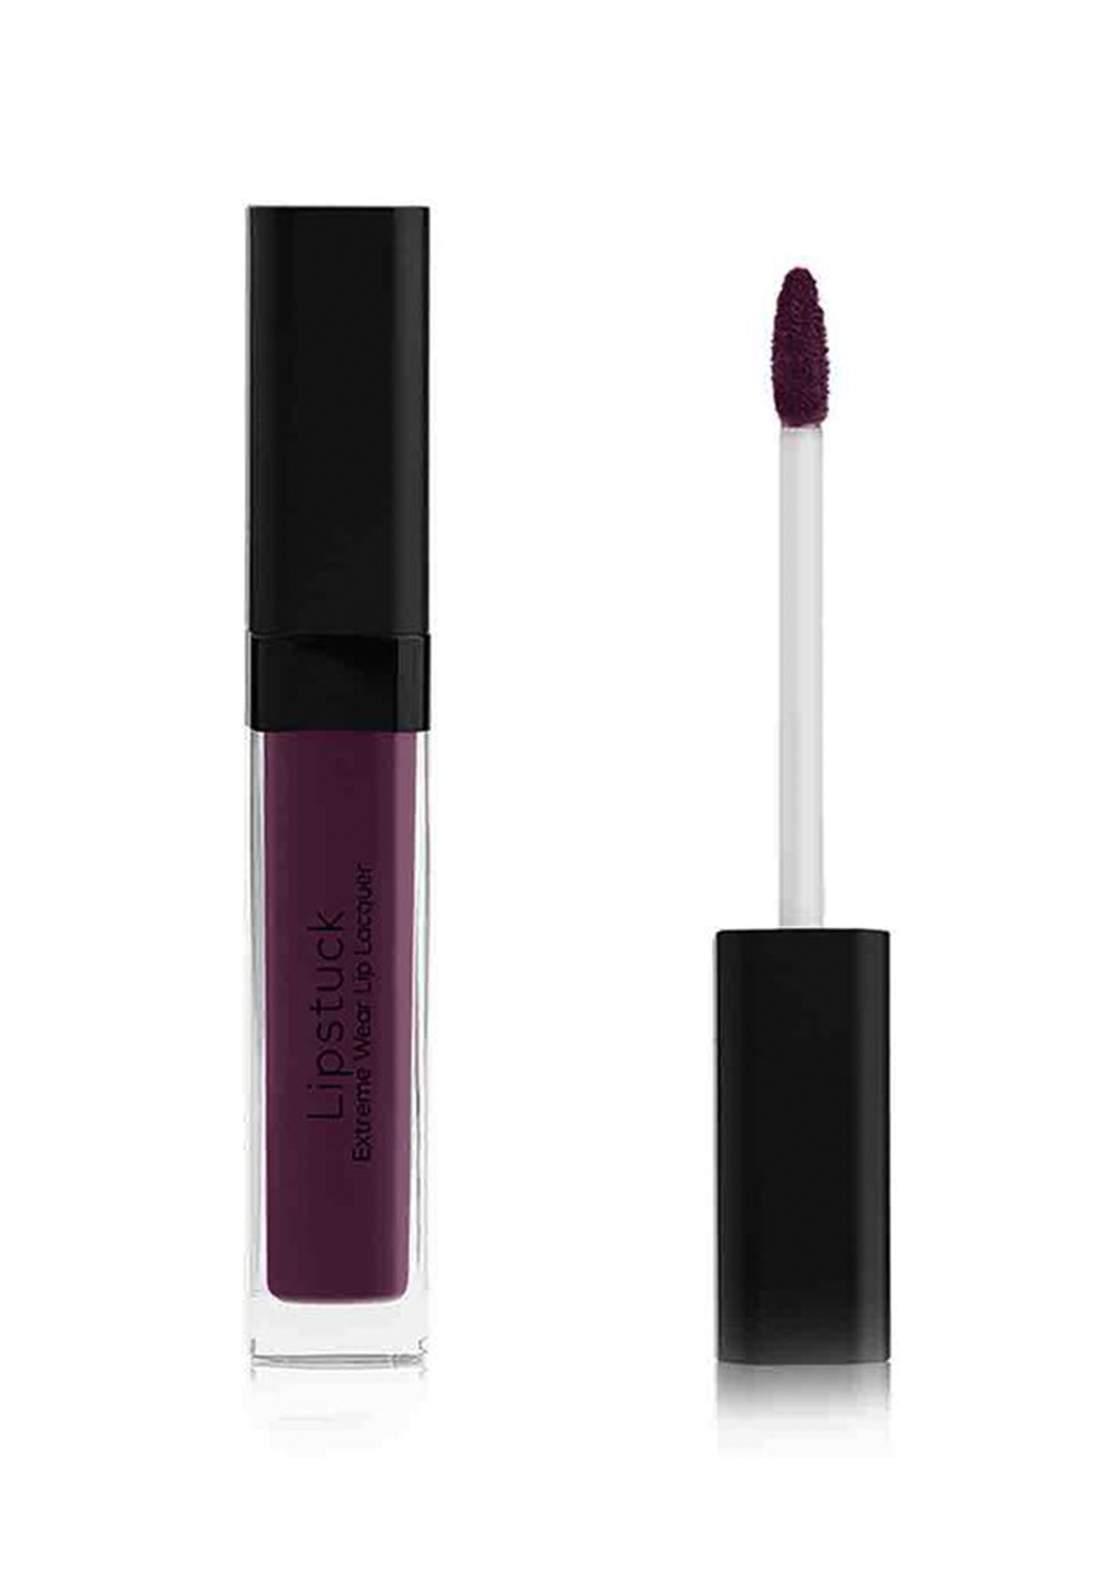 Wow by Wojooh 6M79 Lipstuck Extreme Wear Lip Lacquer No.680 Royal Plum 6.5ml احمر شفاه